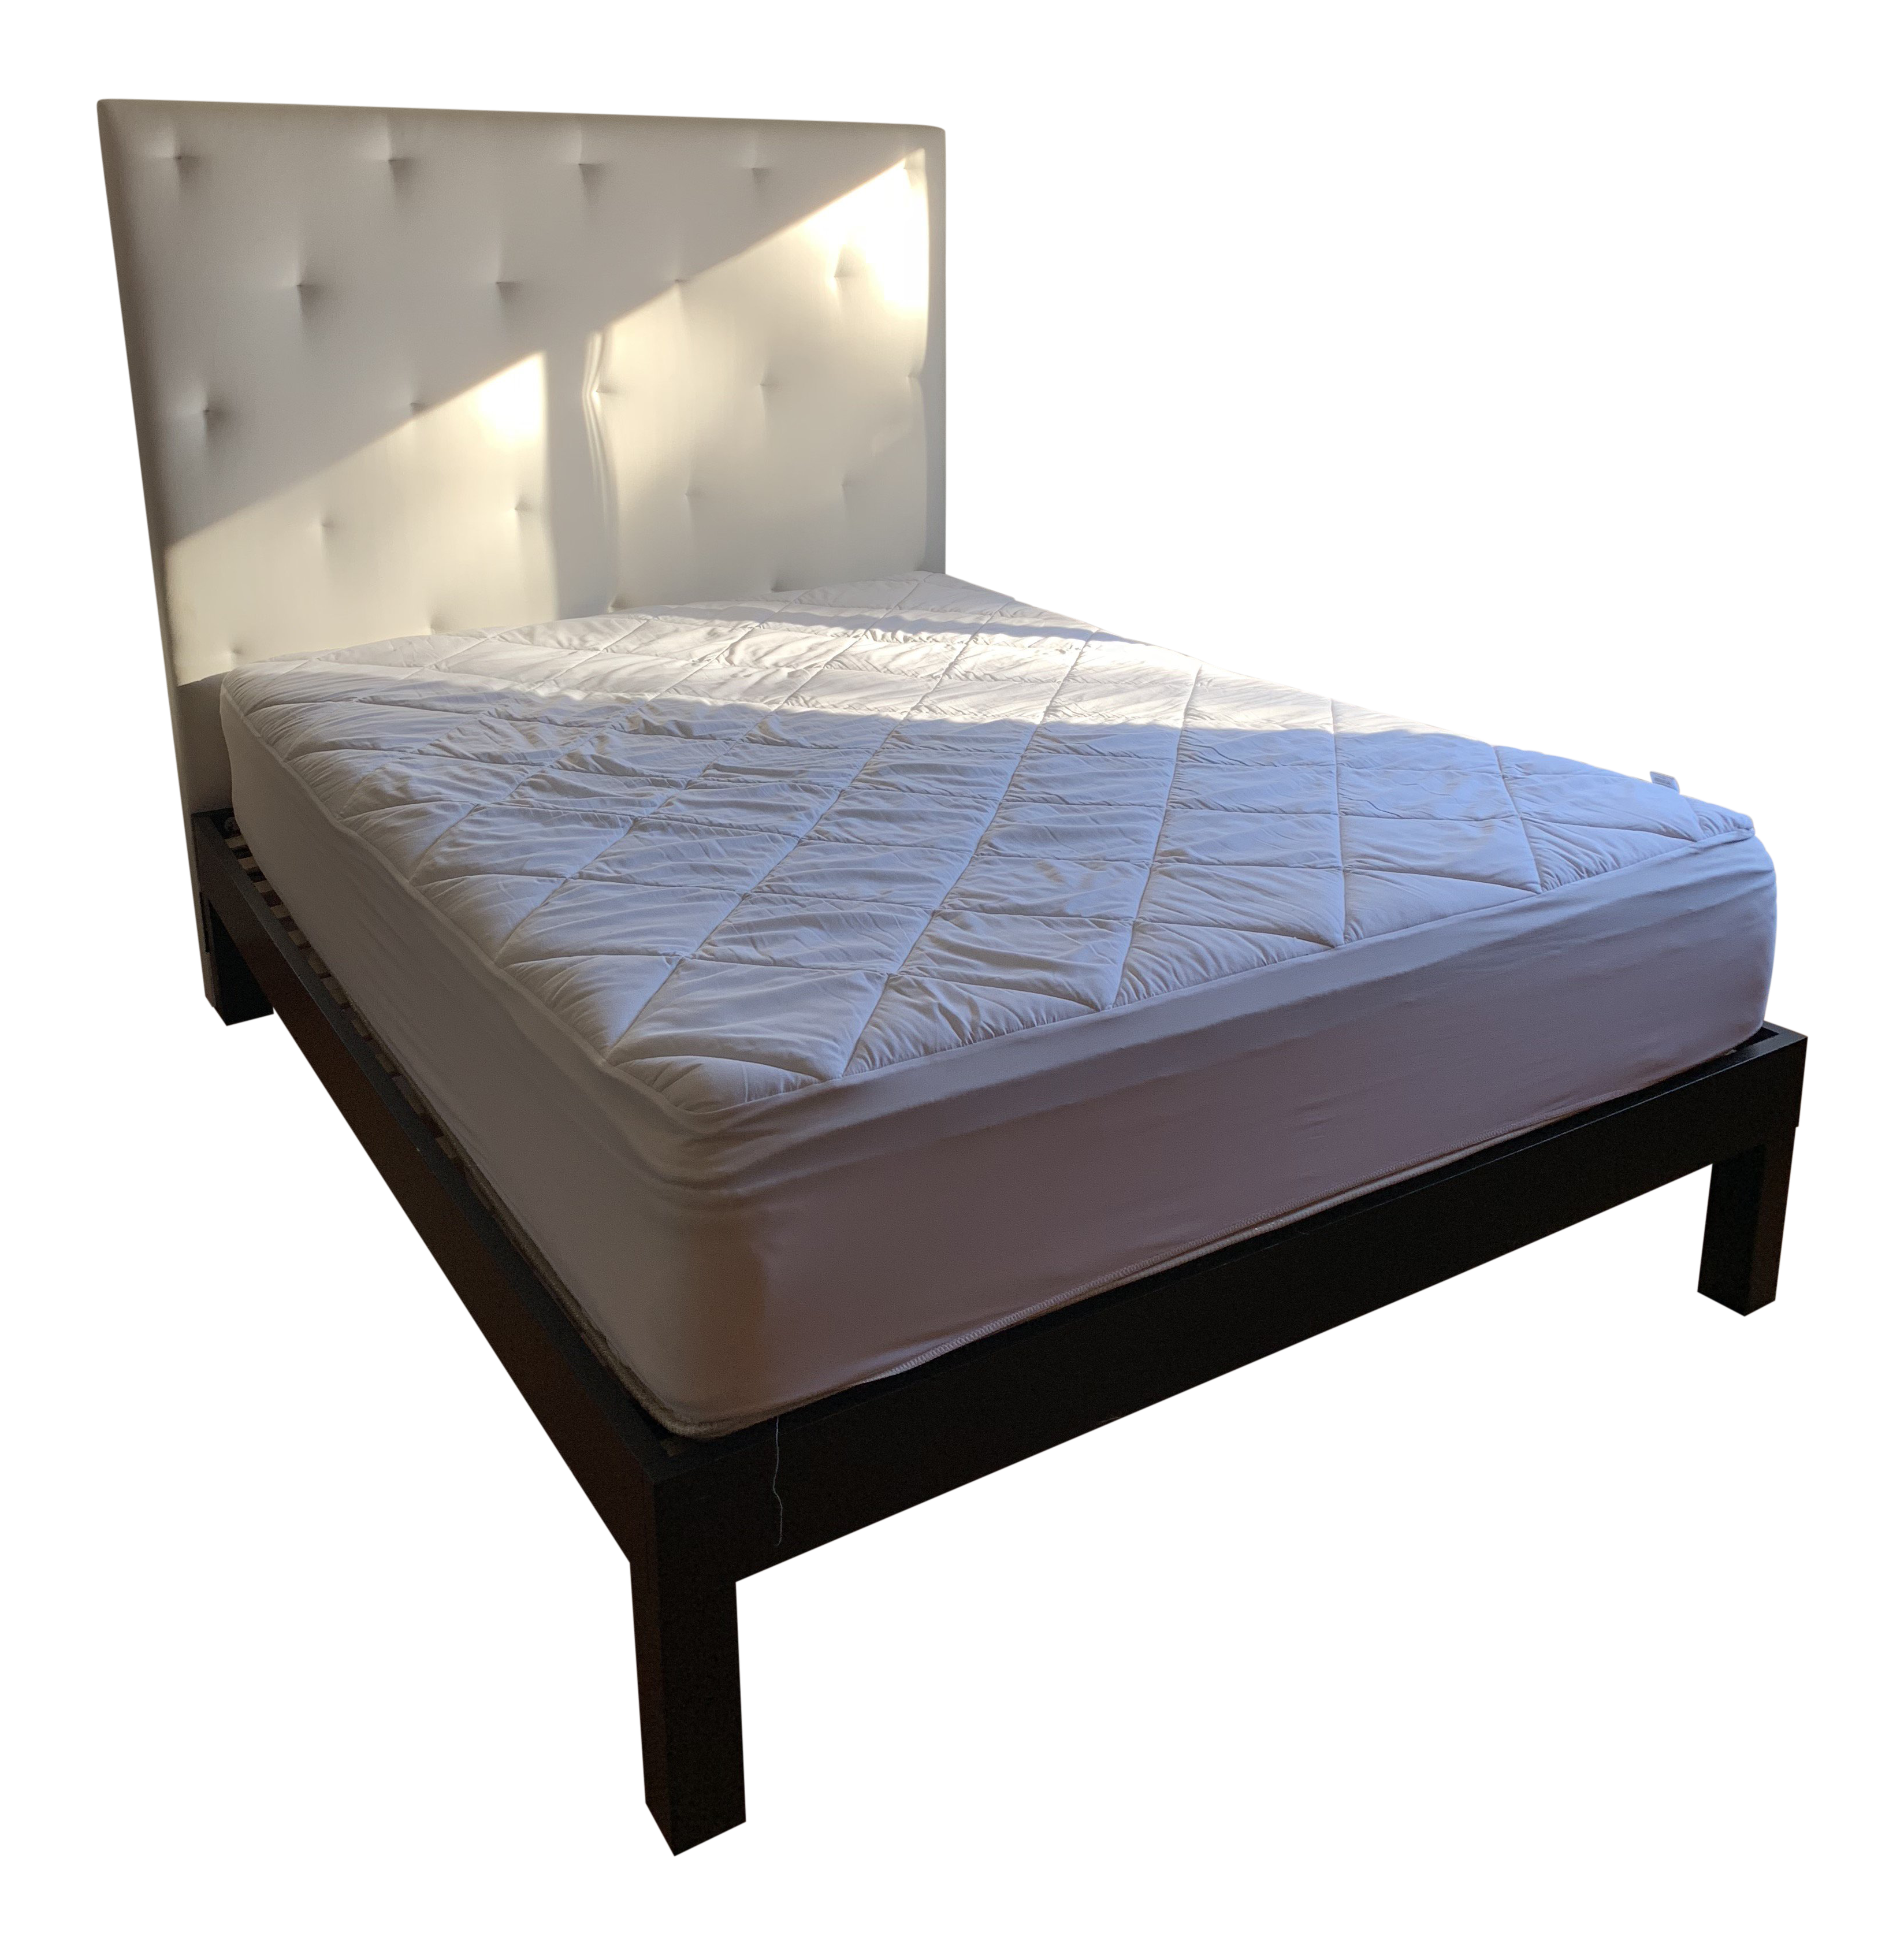 Amazing West Elm Bed Frame Plans Free